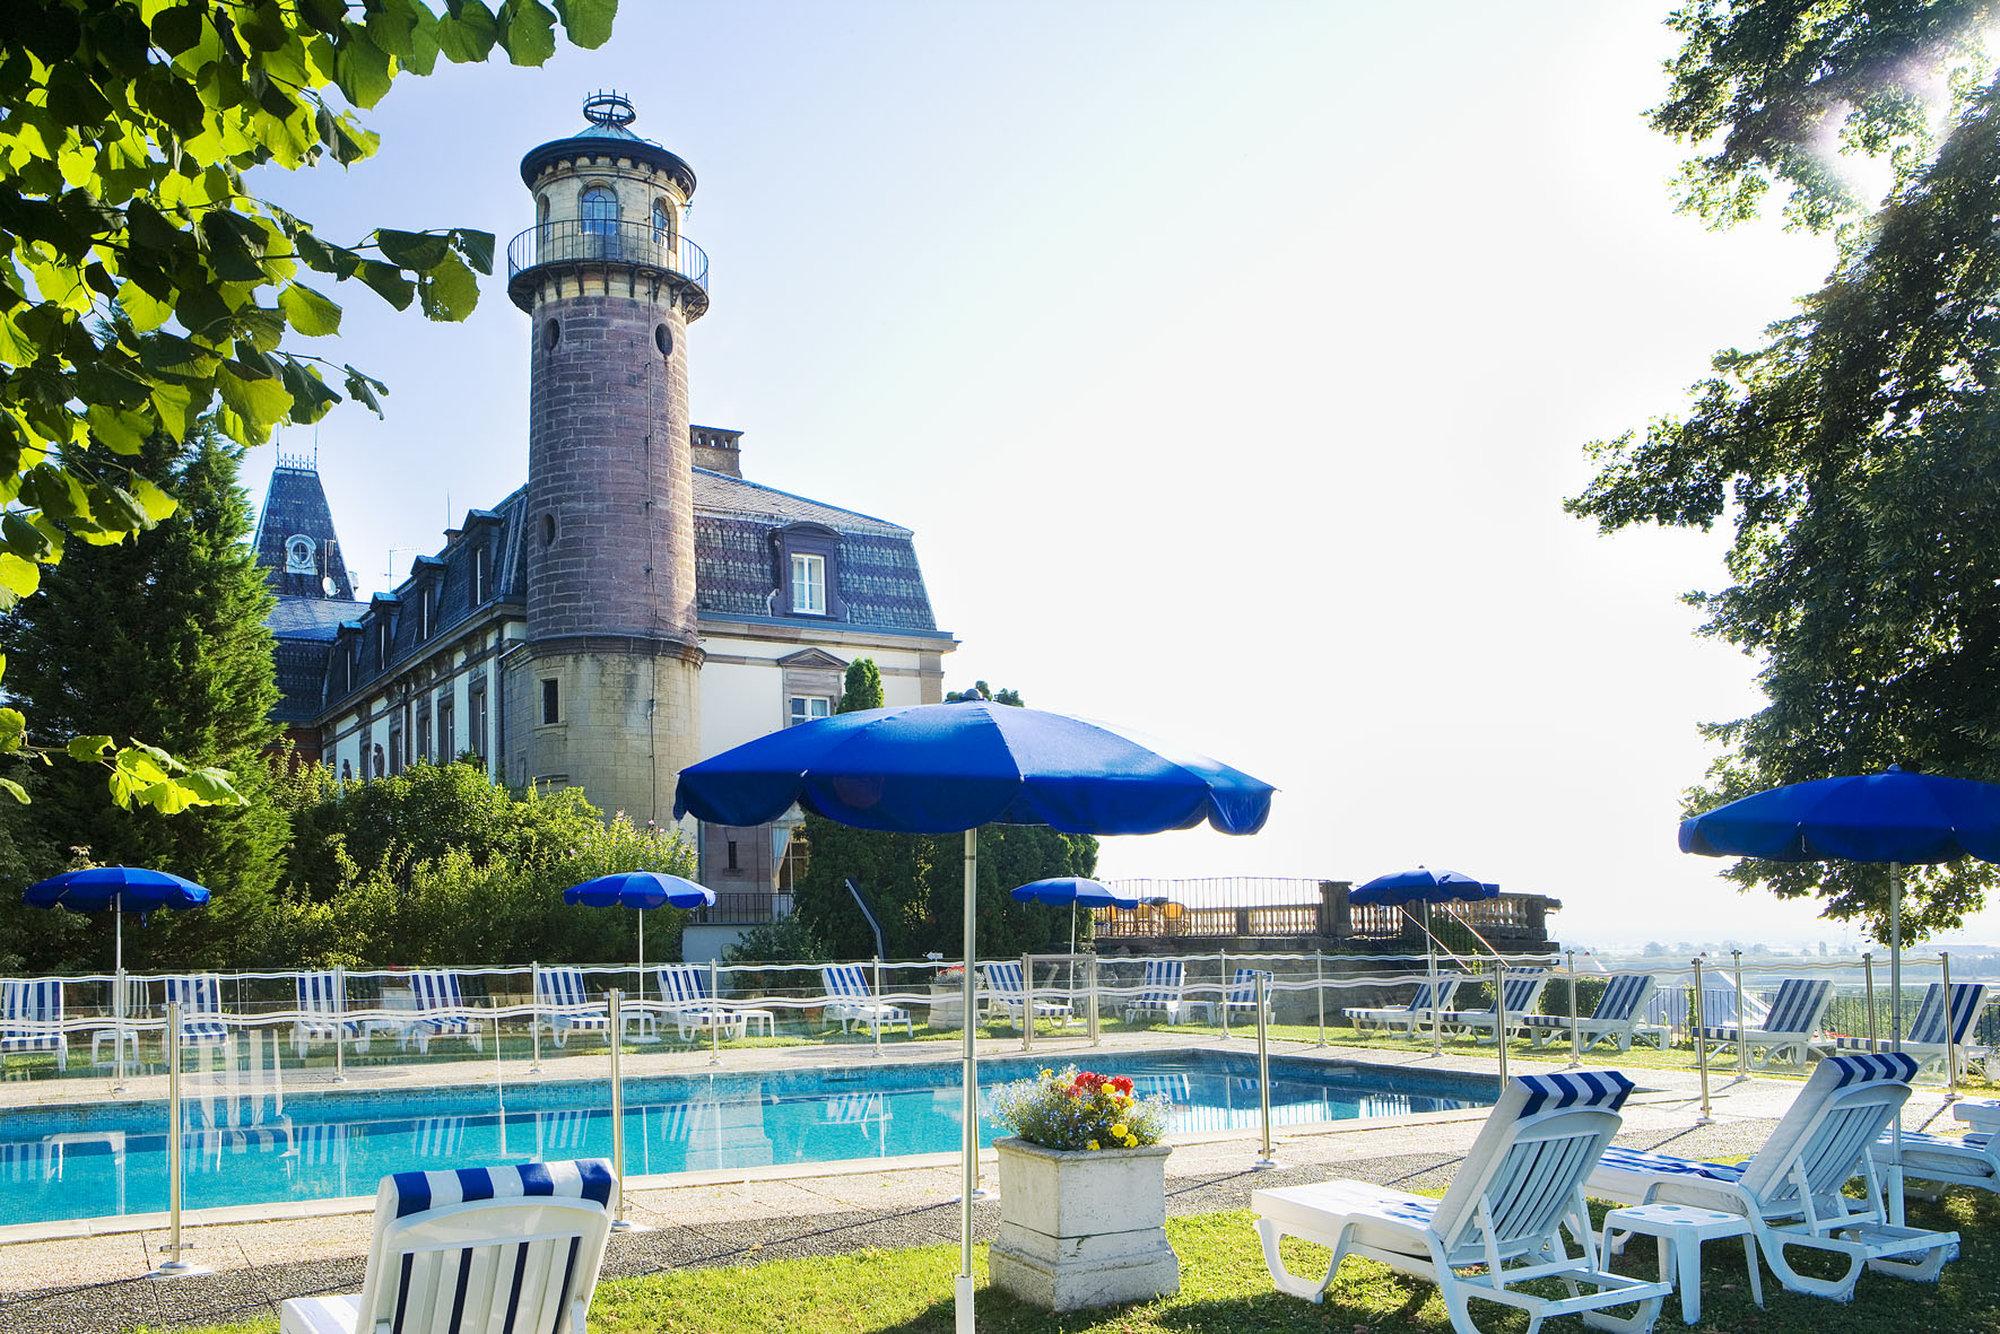 Chateau d'Isenbourg & Spa